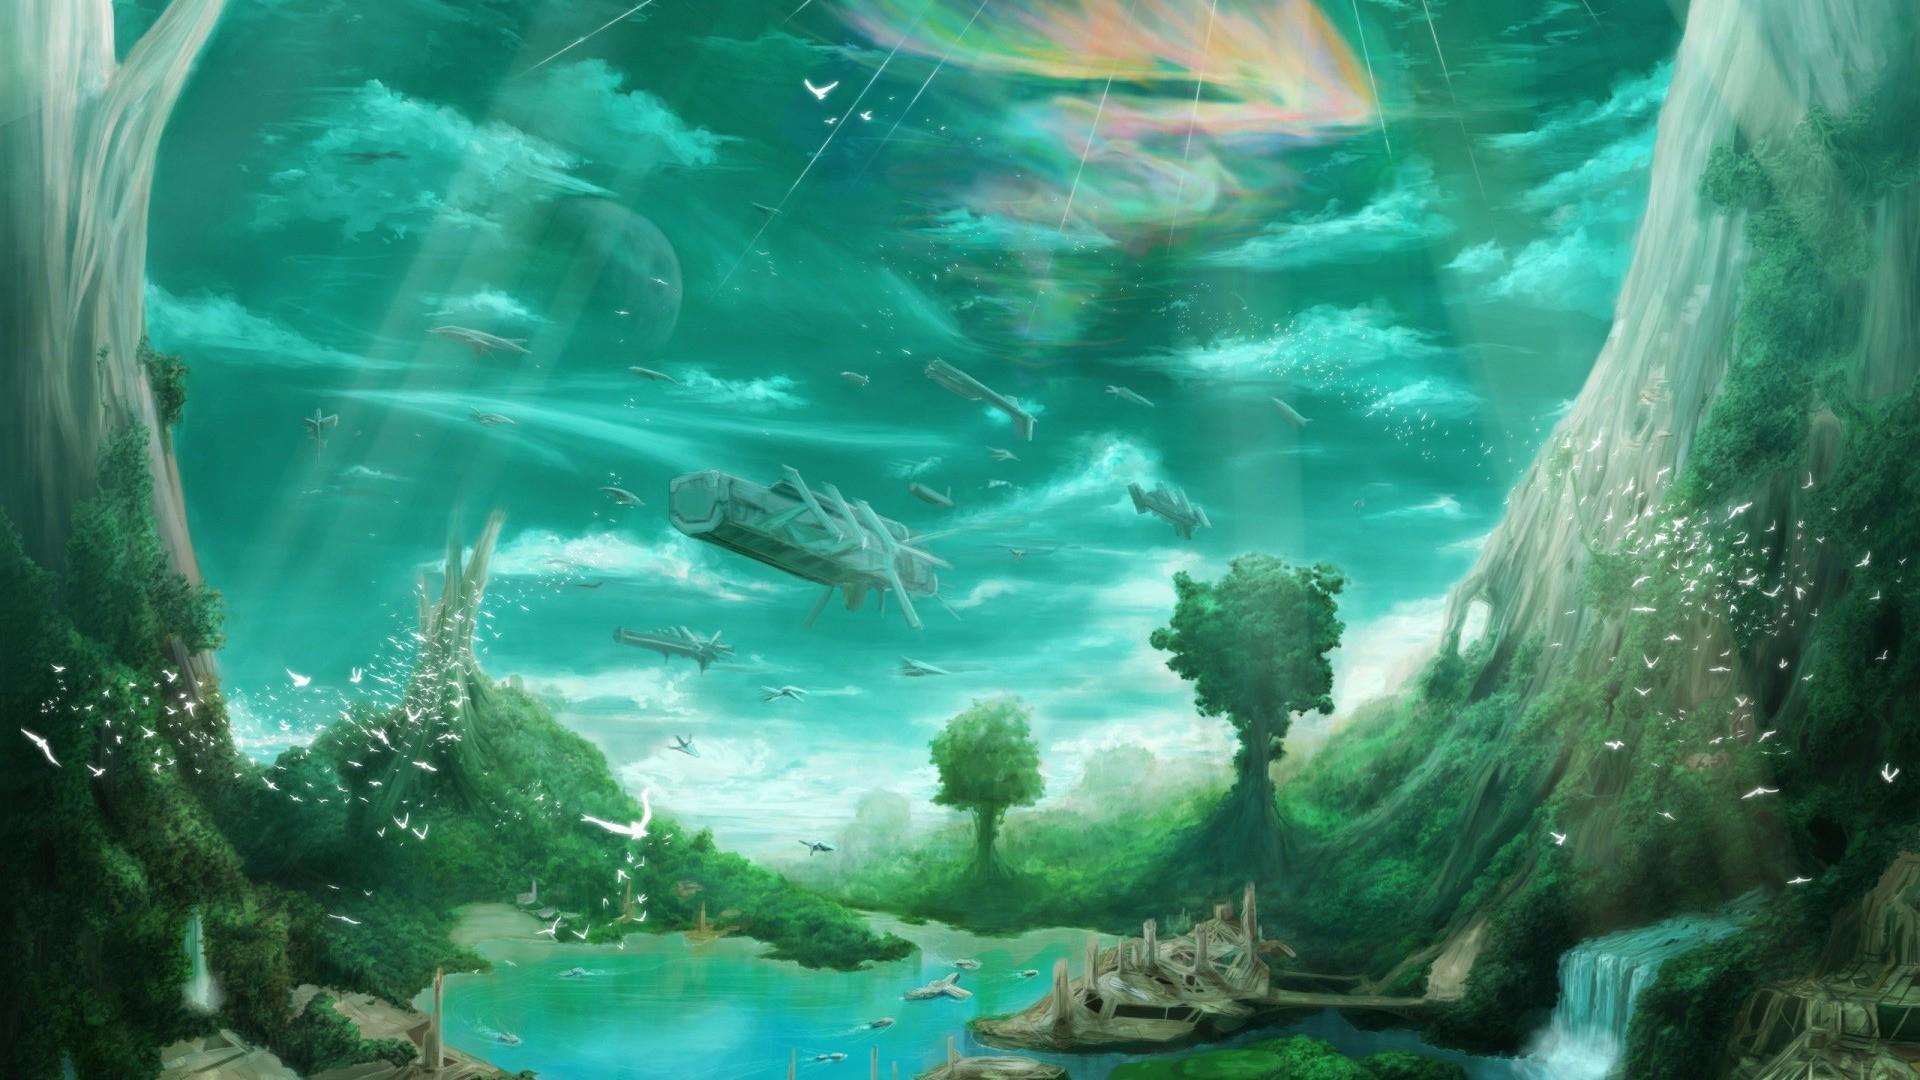 Download Fantasy Paradise Wallpaper Full HD Wallpapers 1920x1080